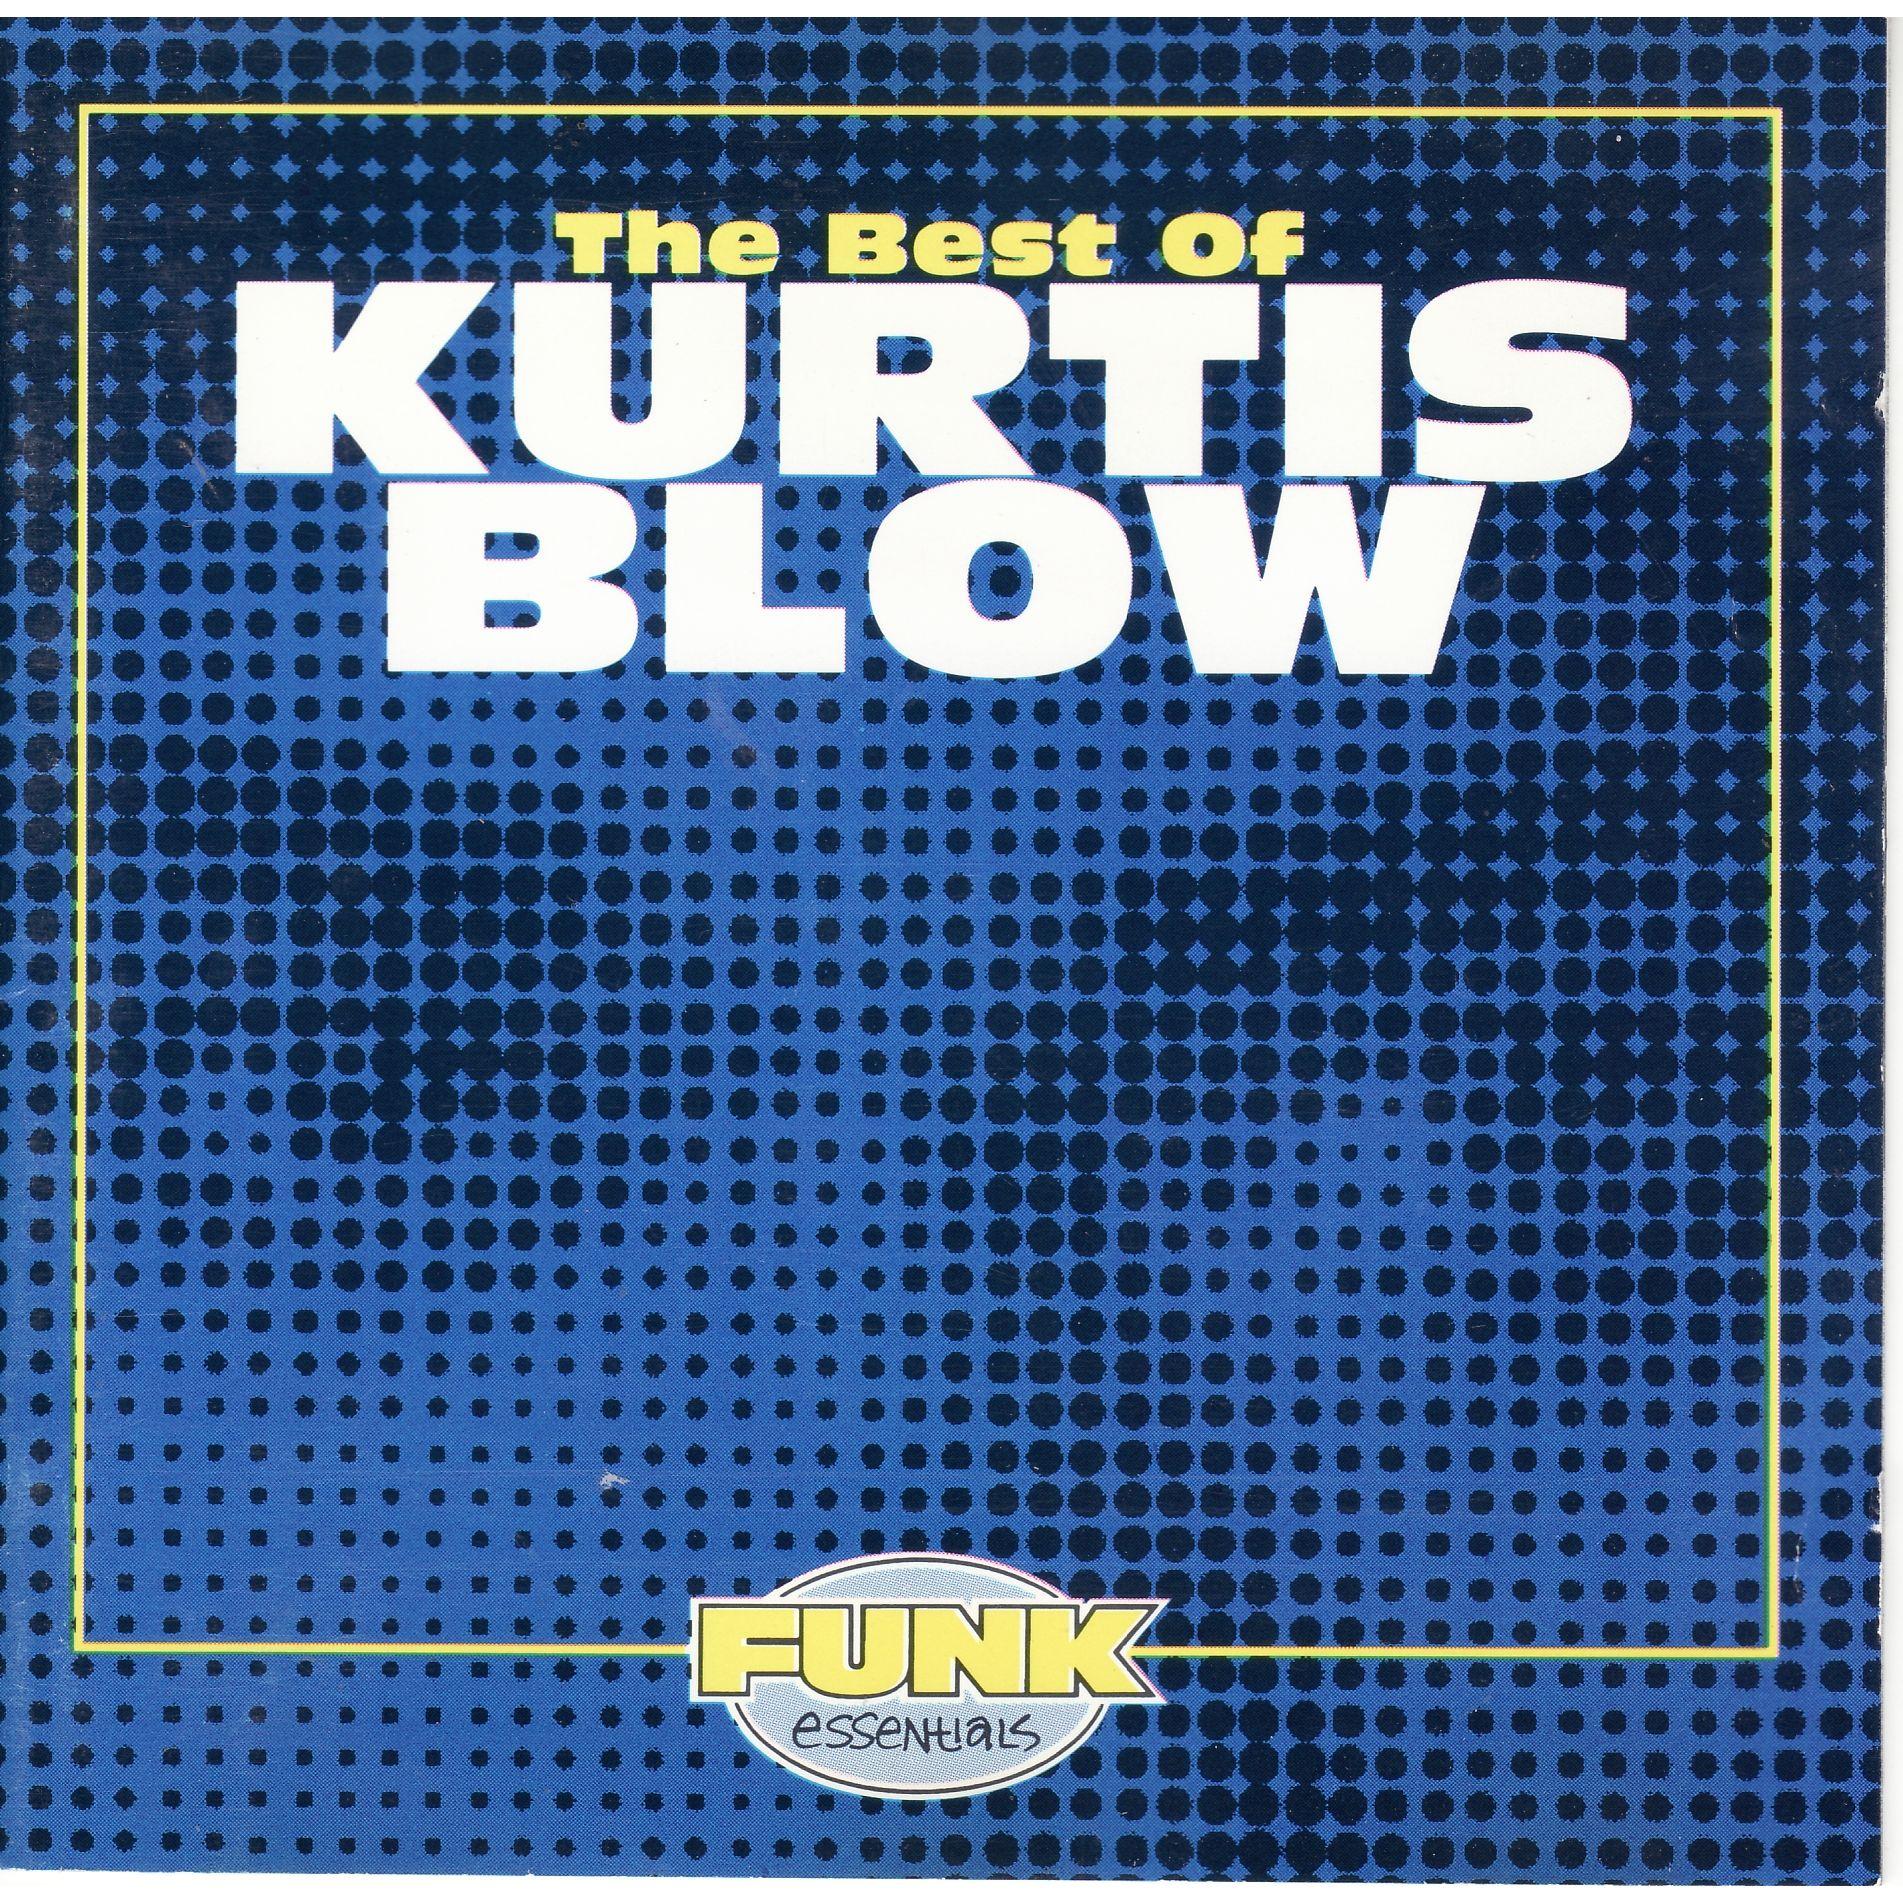 The-Best-Of-Kurtis-Blow-cover.jpg